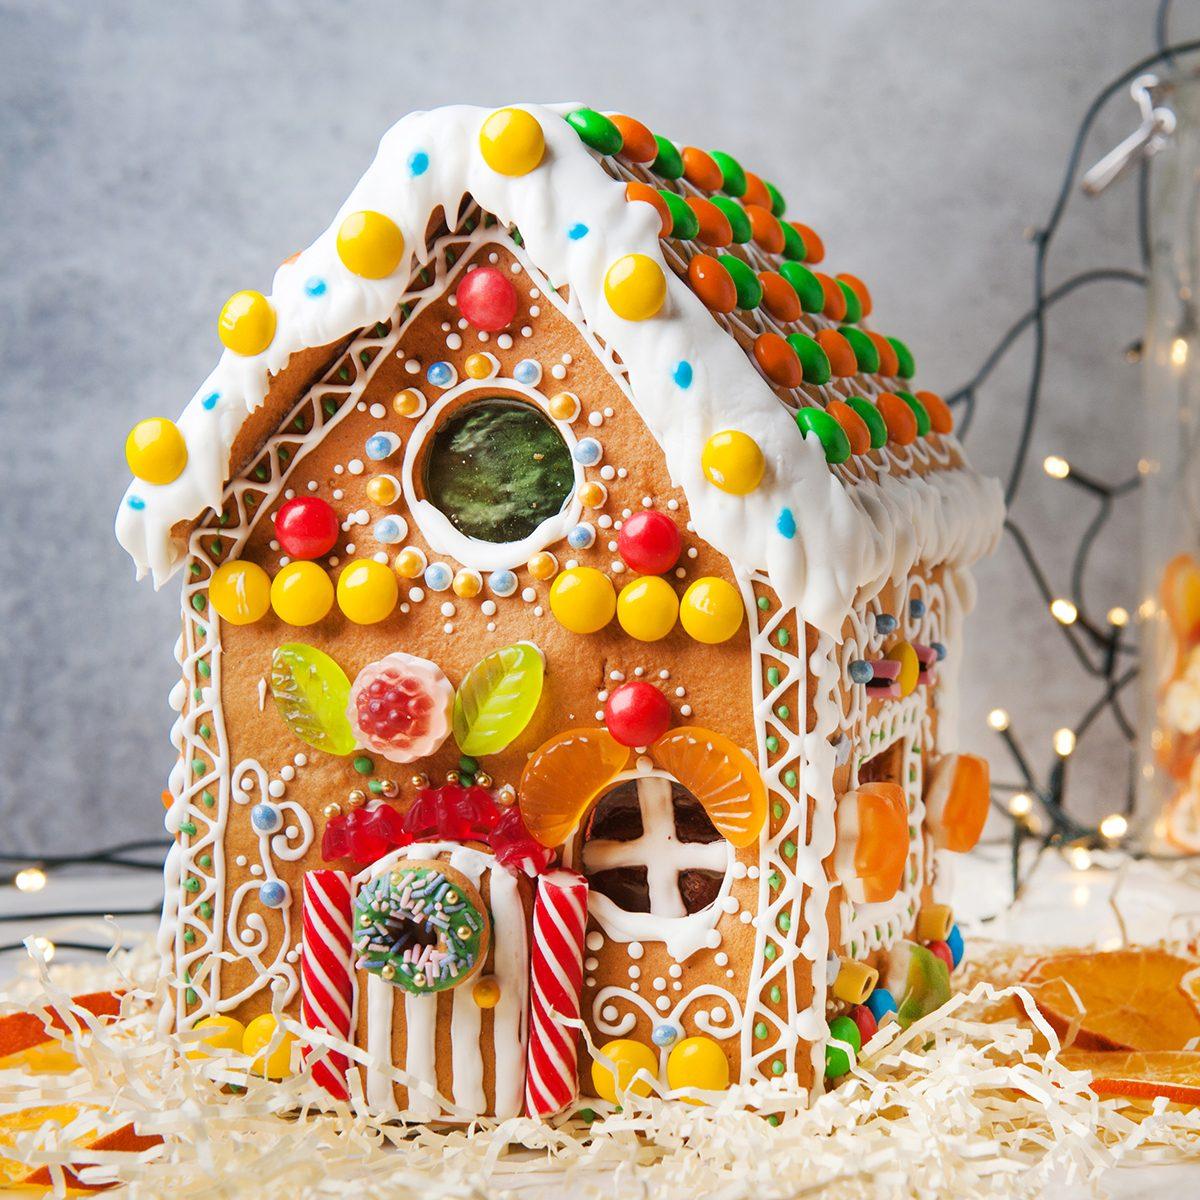 Beautiful gingerbread house